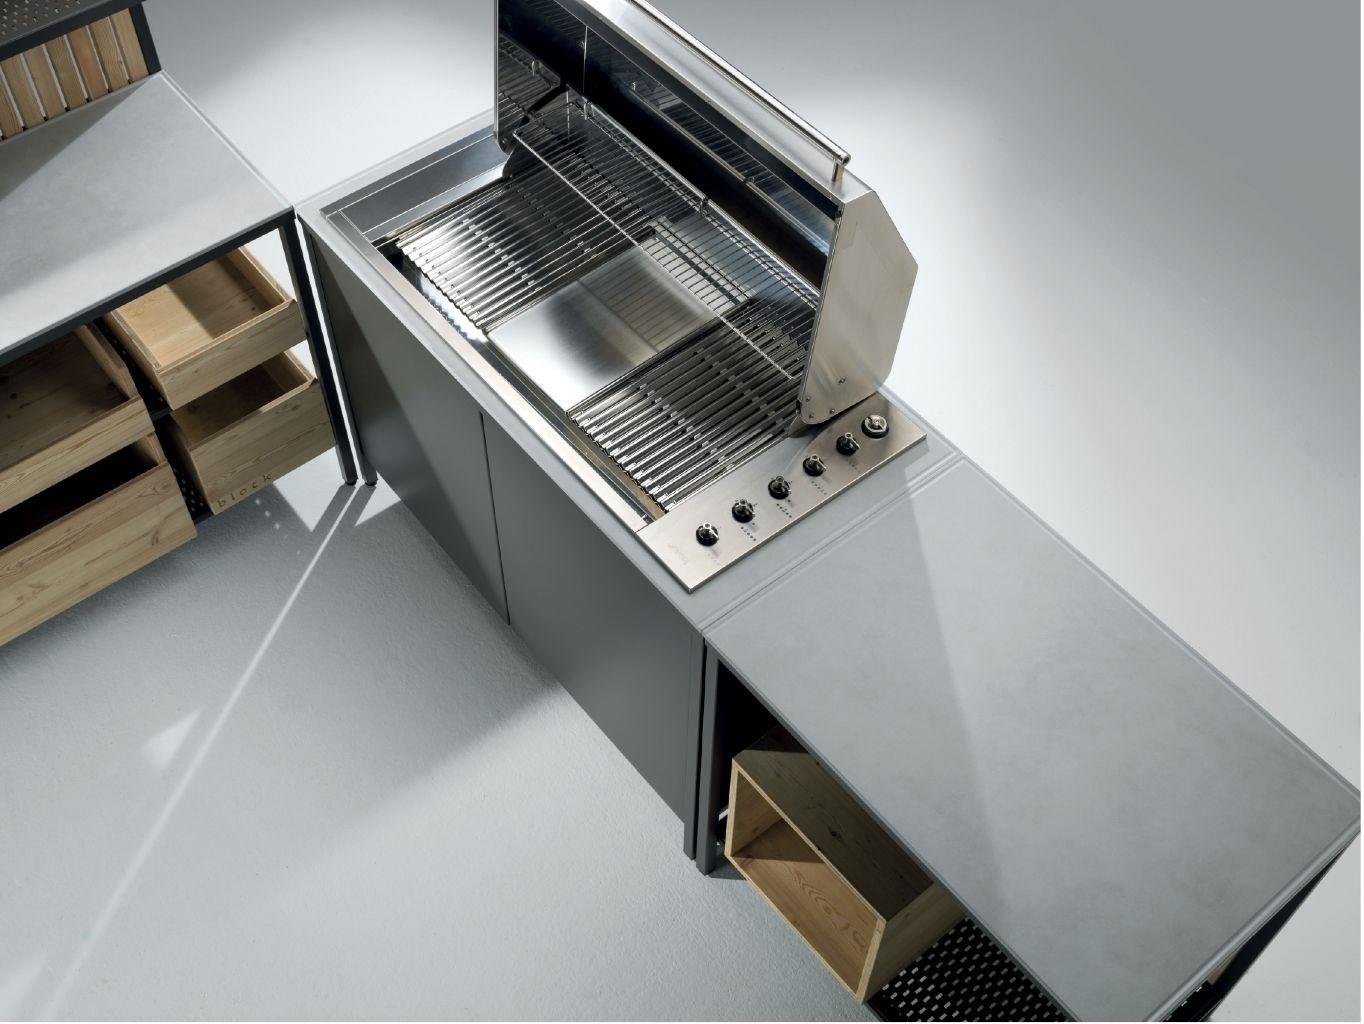 Full Size of Mobile Outdoorküche Outdoor Kchen Mnchensd Küche Wohnzimmer Mobile Outdoorküche